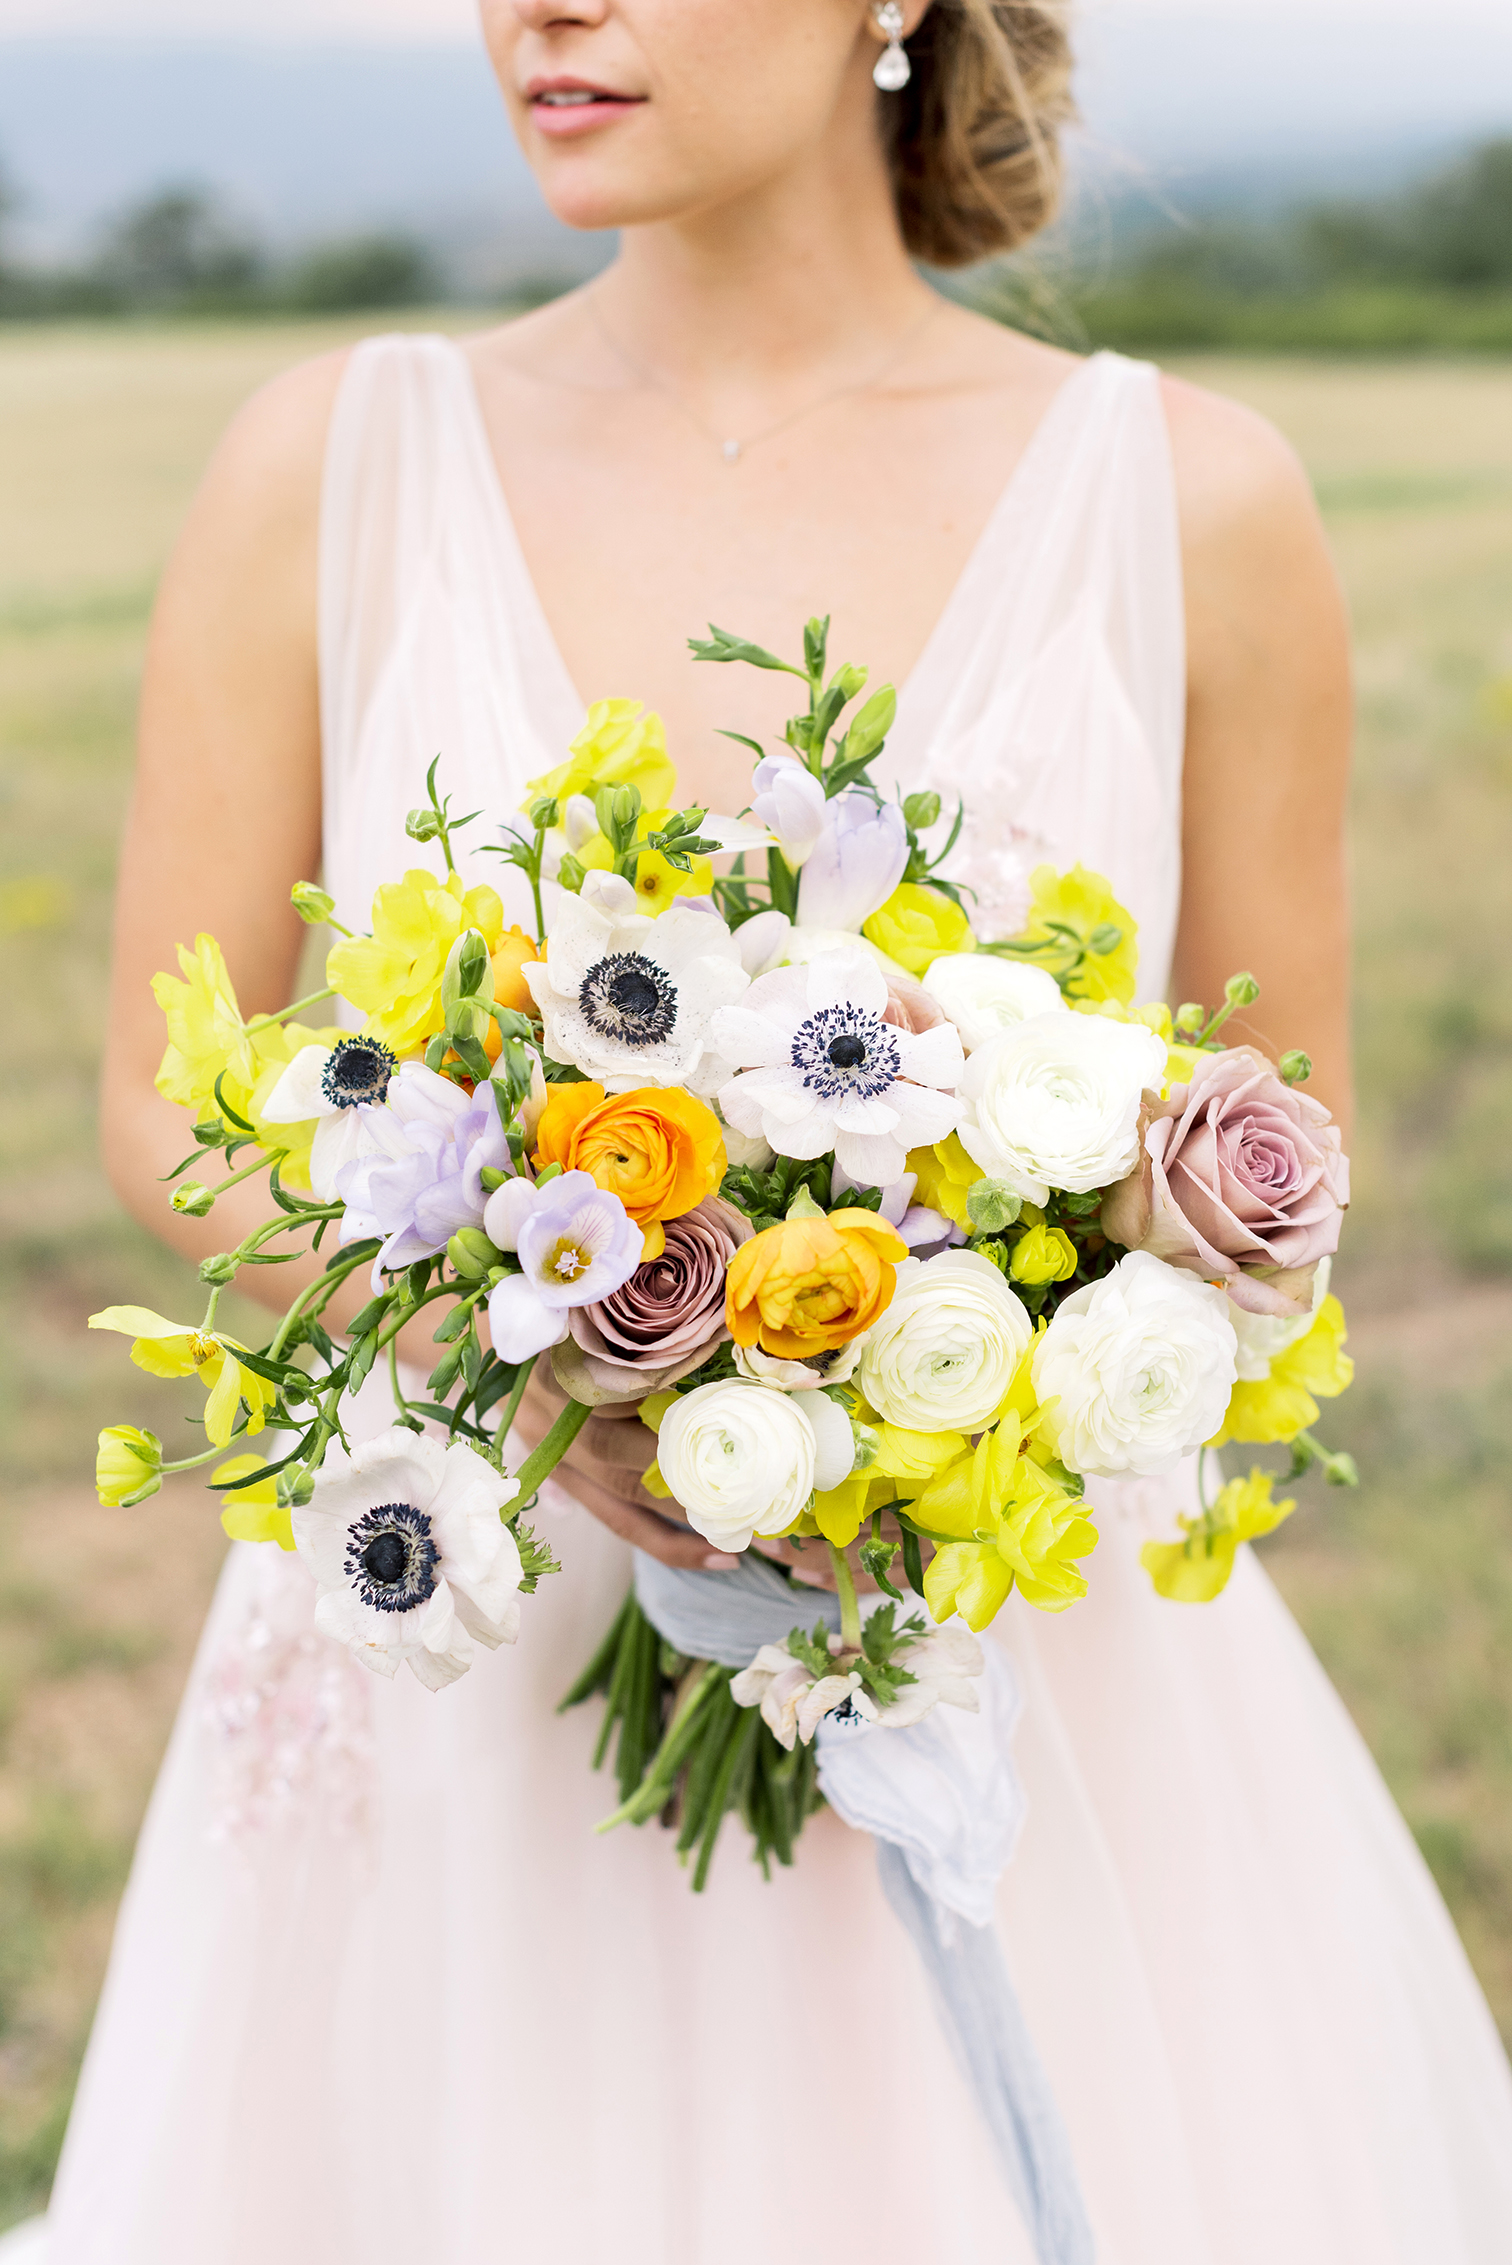 Colorado Wedding Photographers, Summer Wedding Bouquets, Film Photographers in Colorado, Mountain Destination Weddings